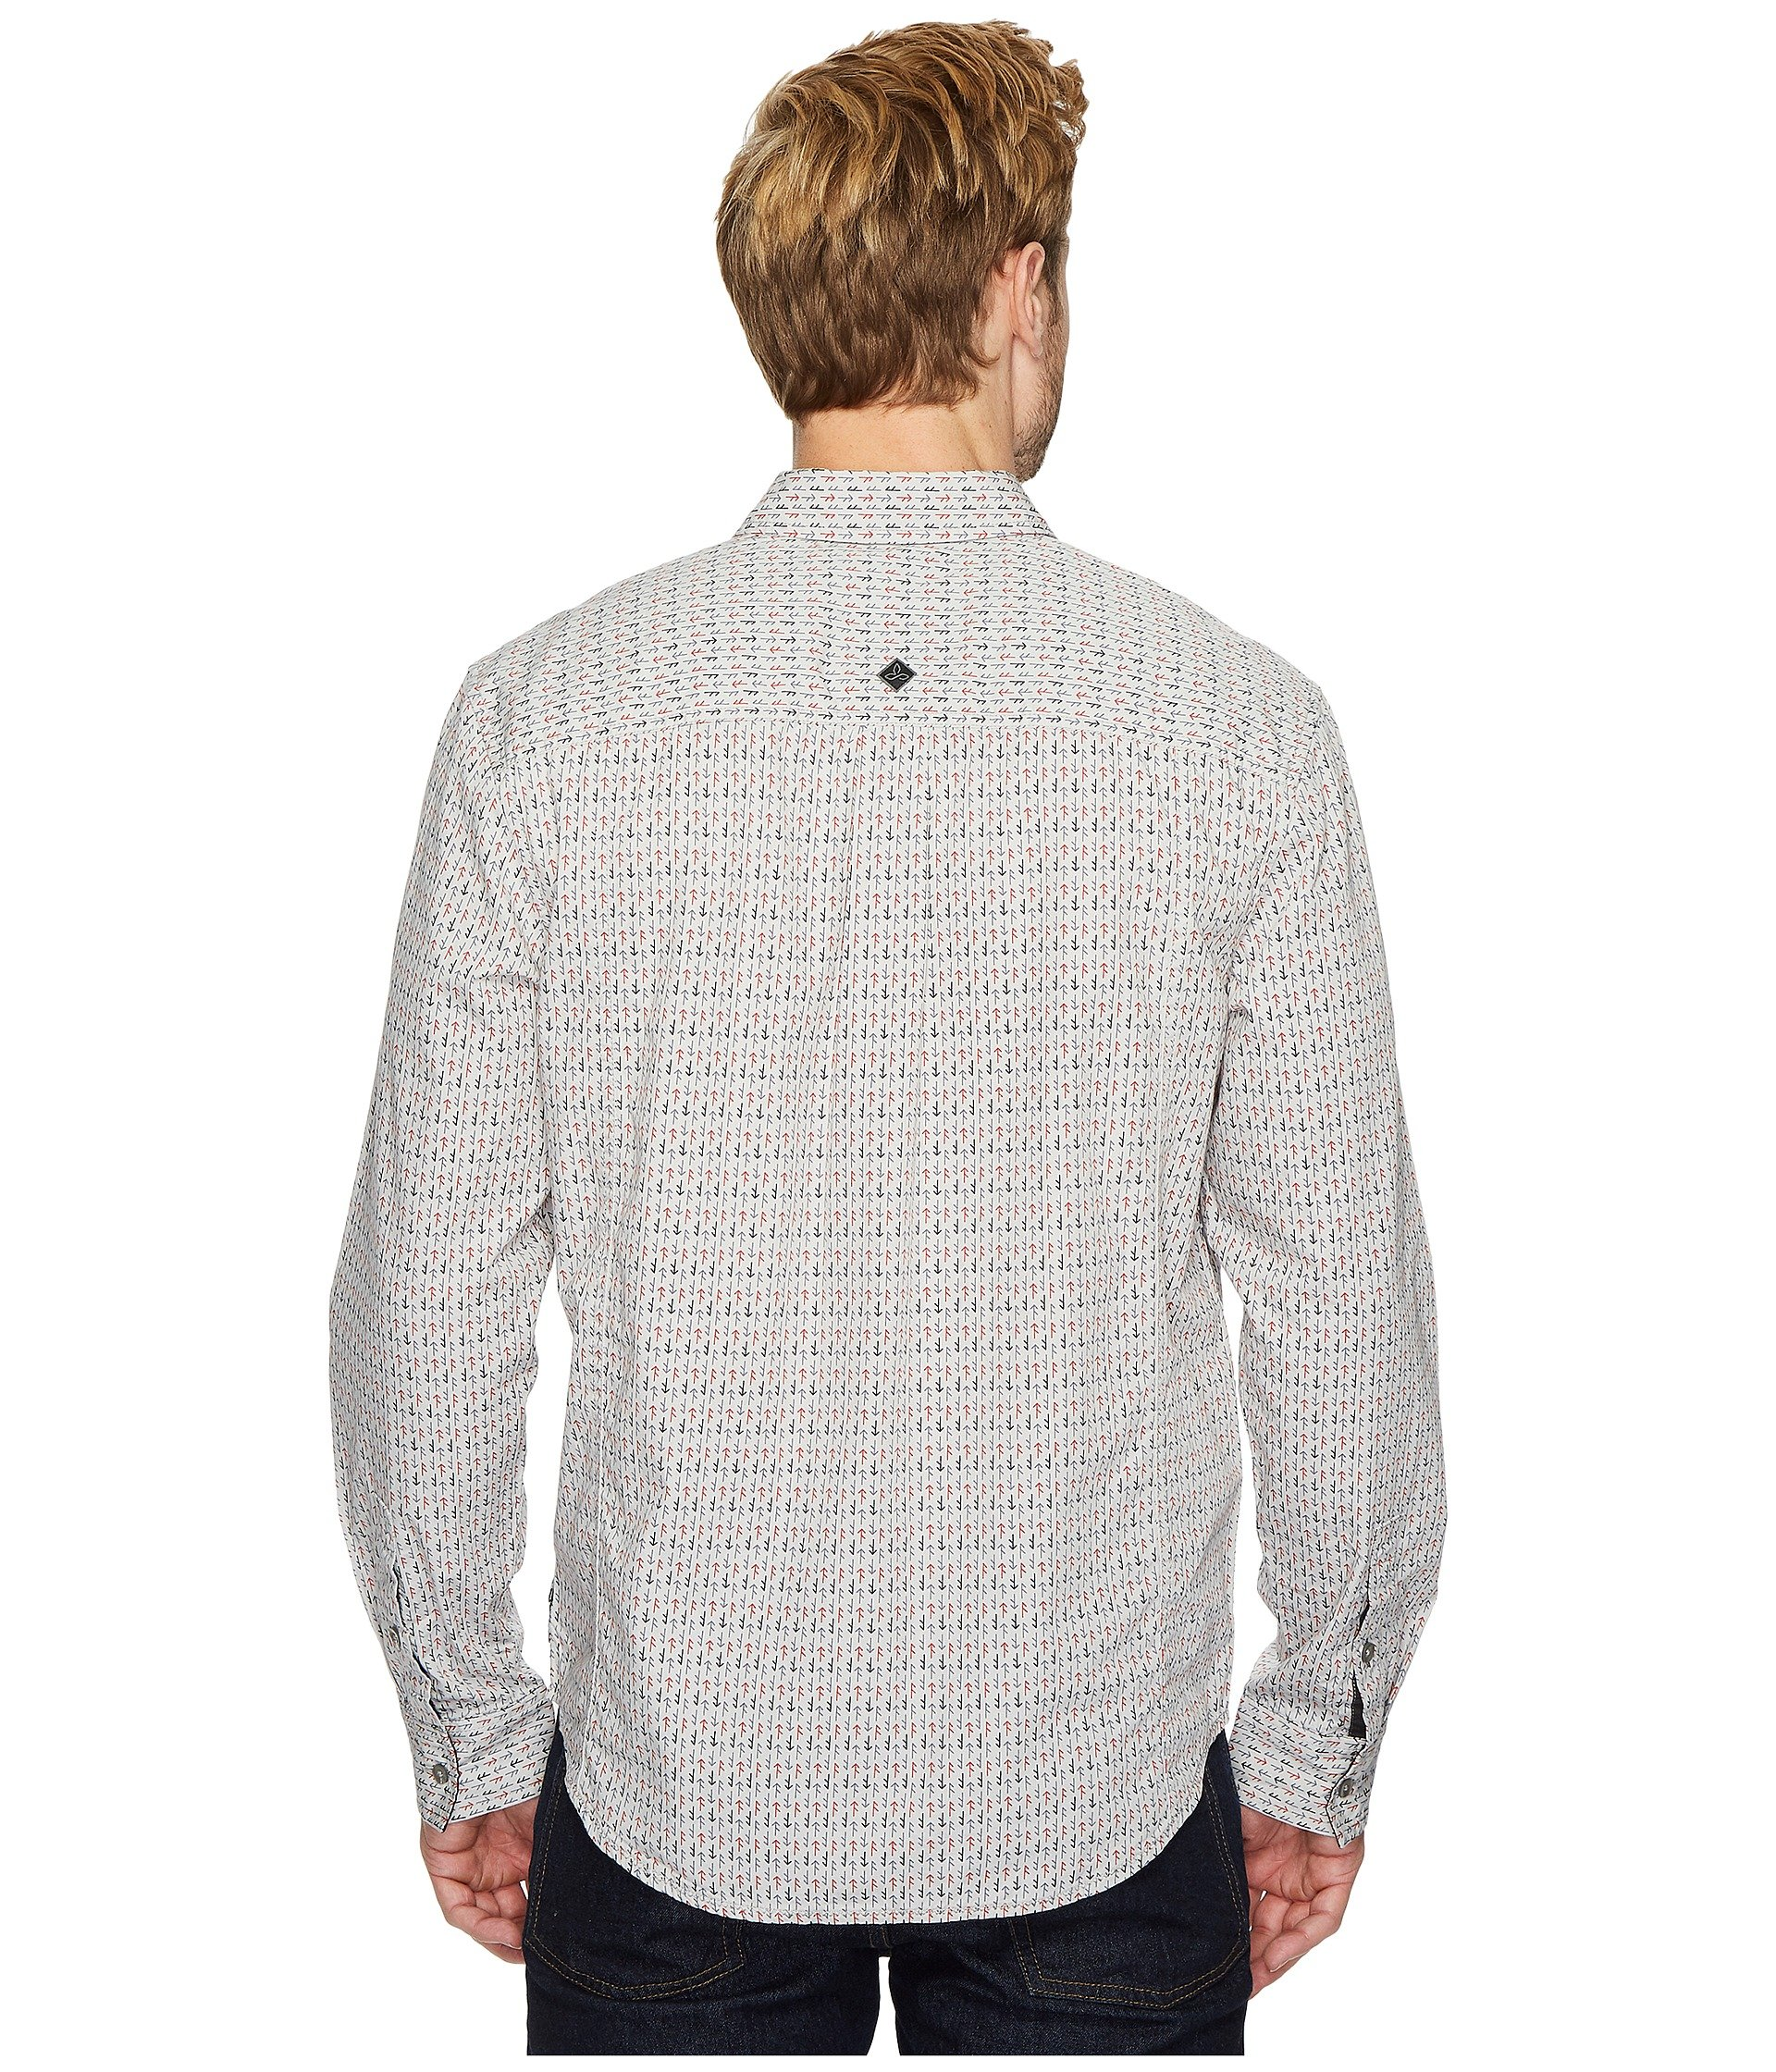 Prana Gravel Prana Shirt Lukas Shirt Shirt Lukas Prana Gravel Lukas TPwq5UvY